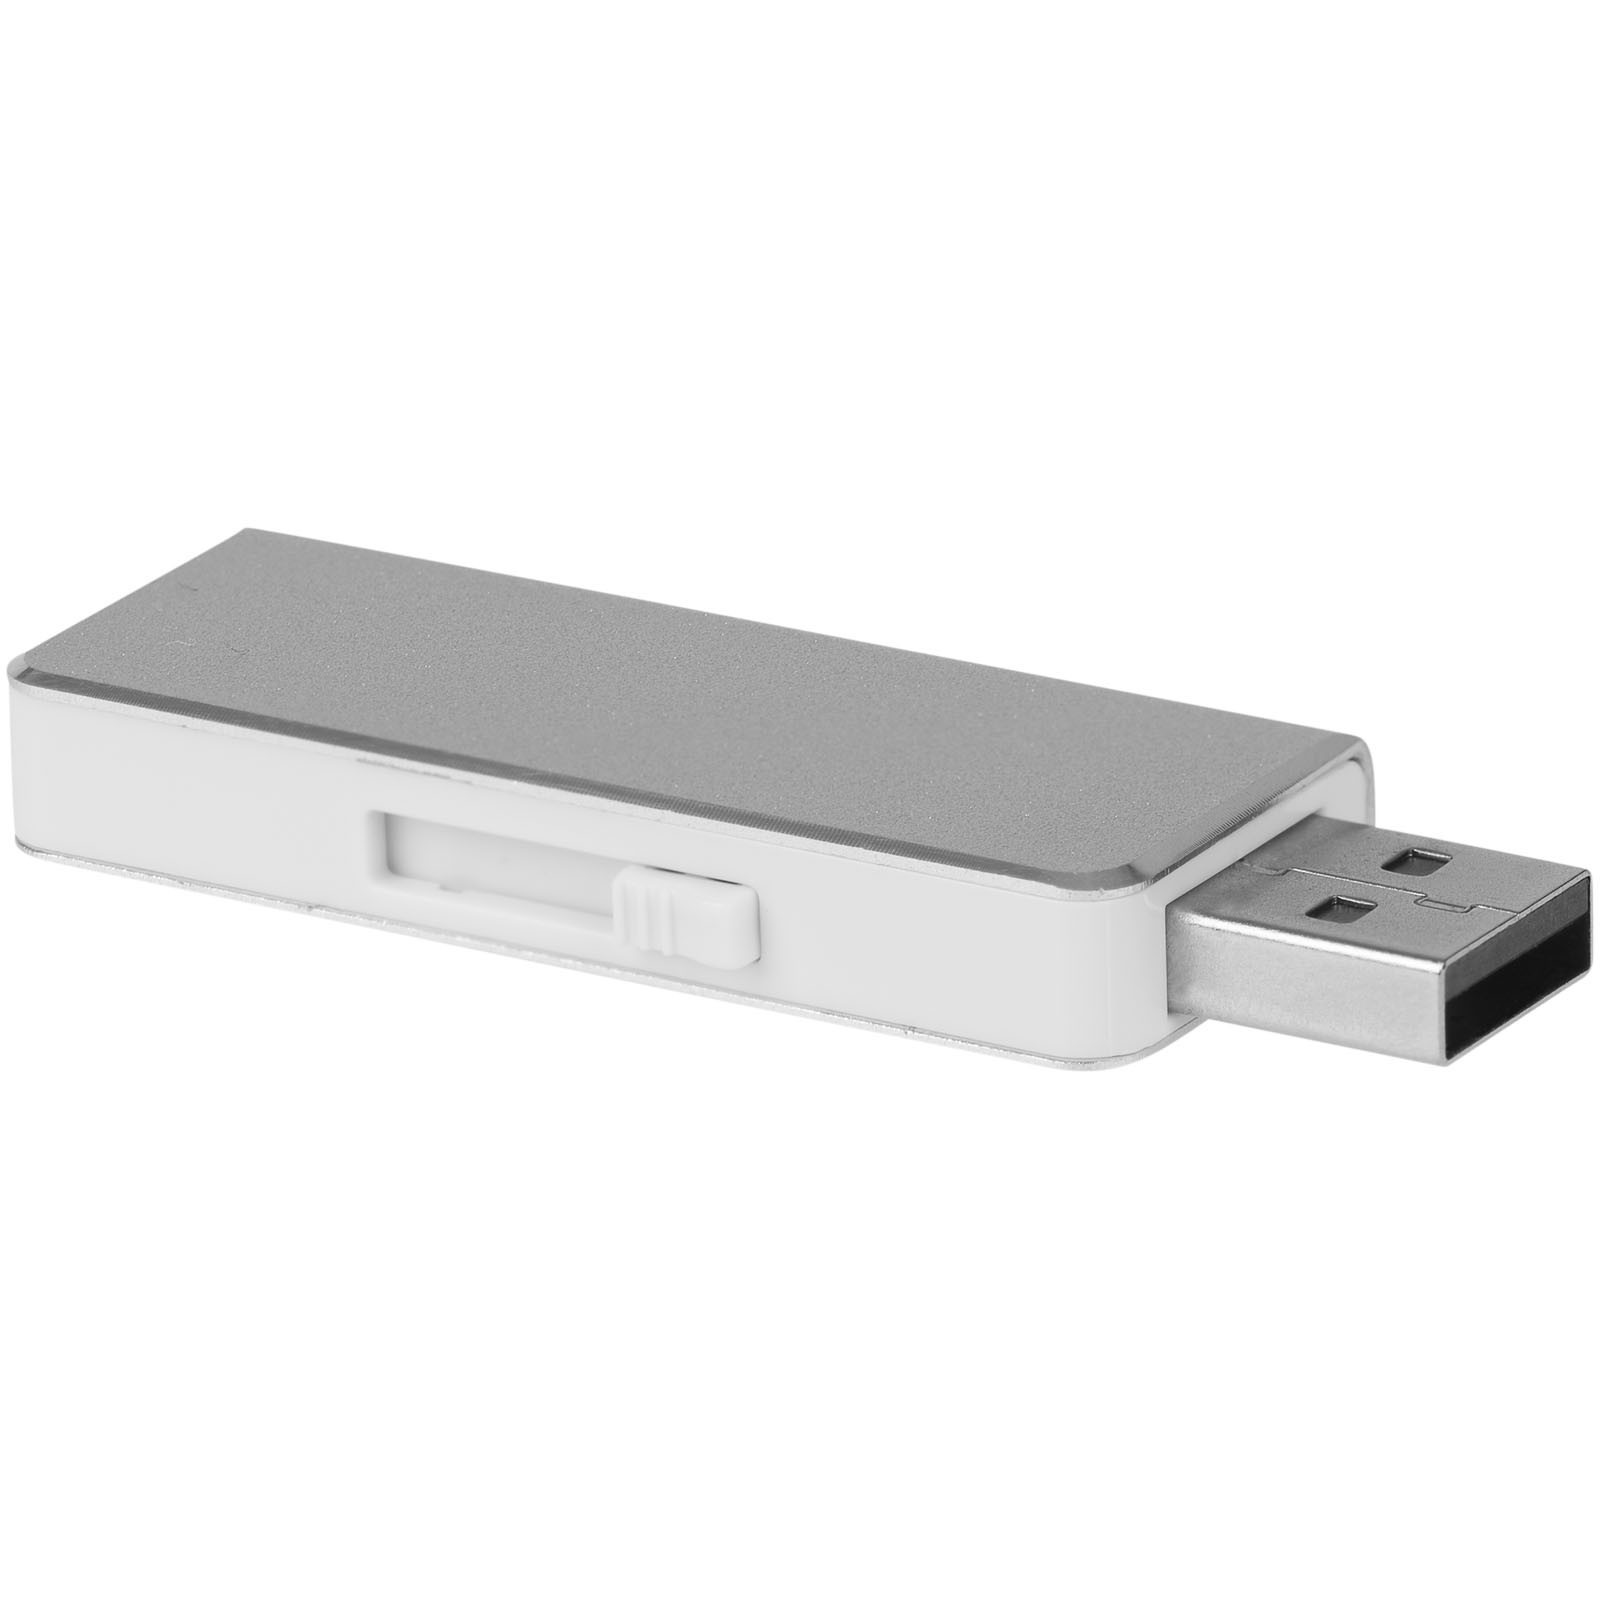 Pamięć USB 4 GB Glide - Srebrny